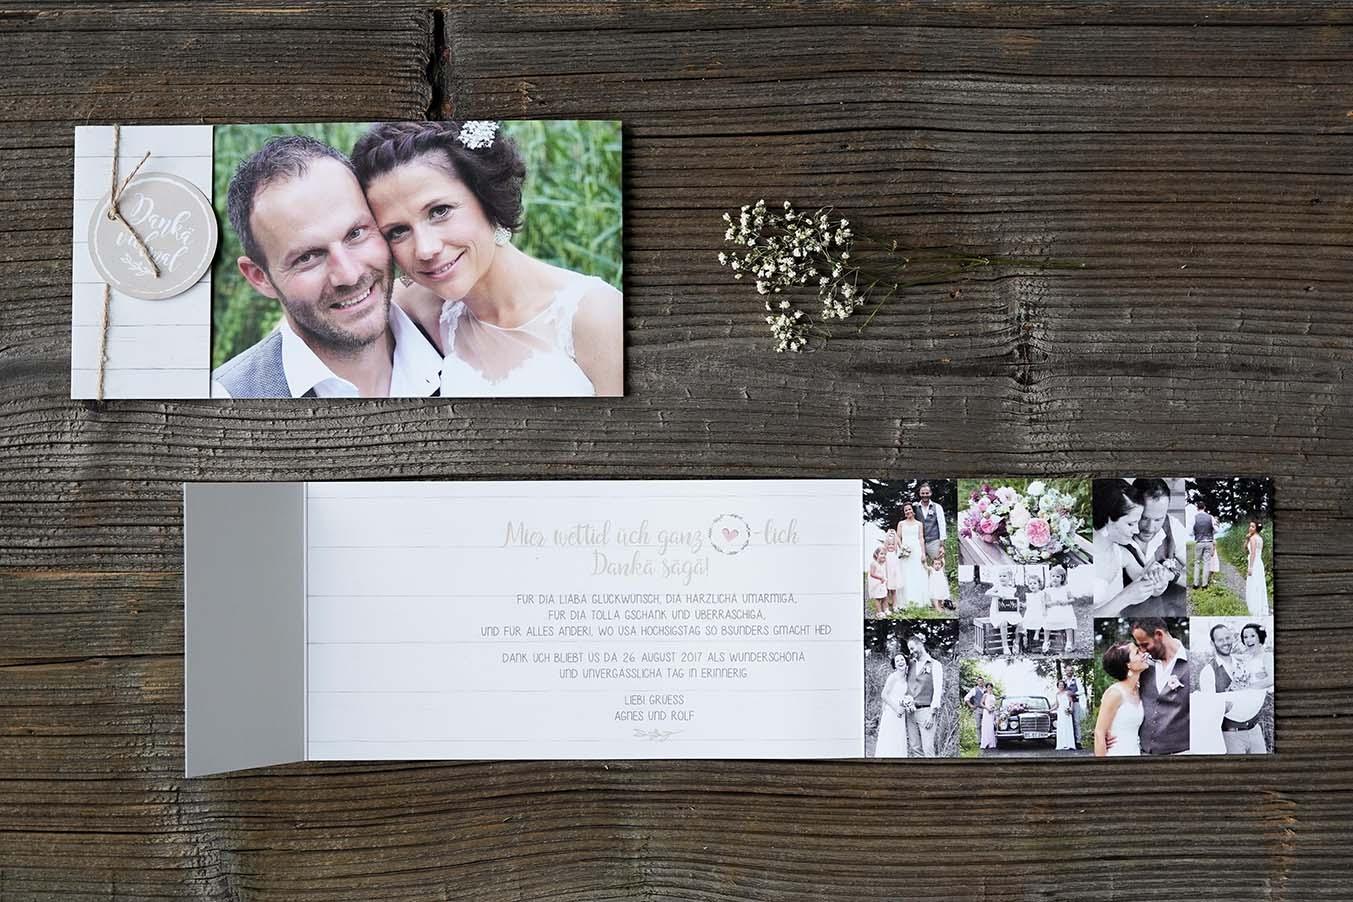 Hochzeitsdankeskarte Rolf & Agnes